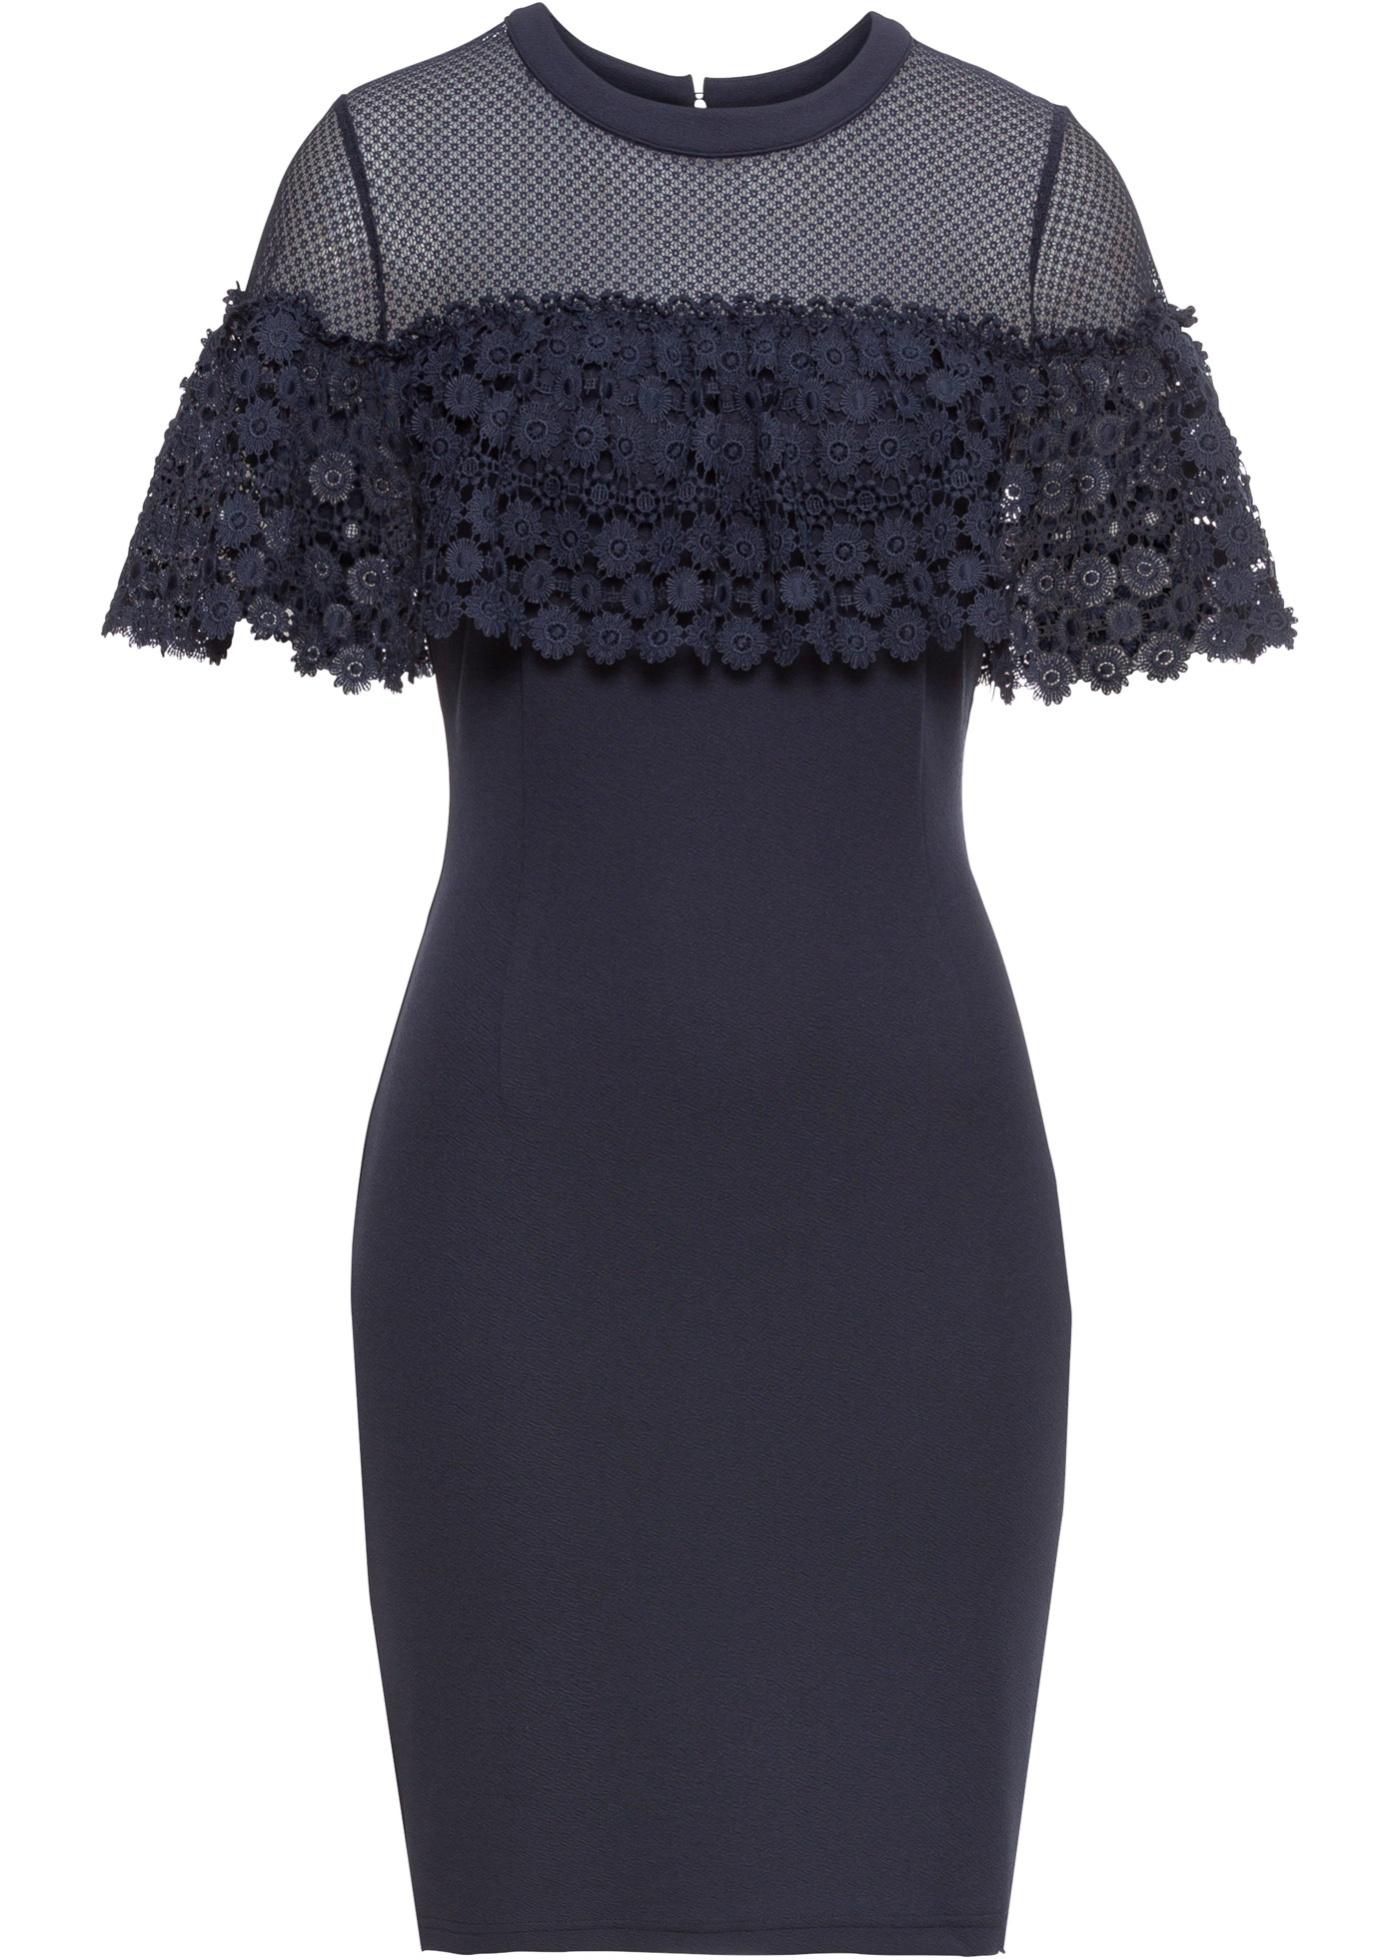 6445a7232a50 Krajkové šaty - Modrá